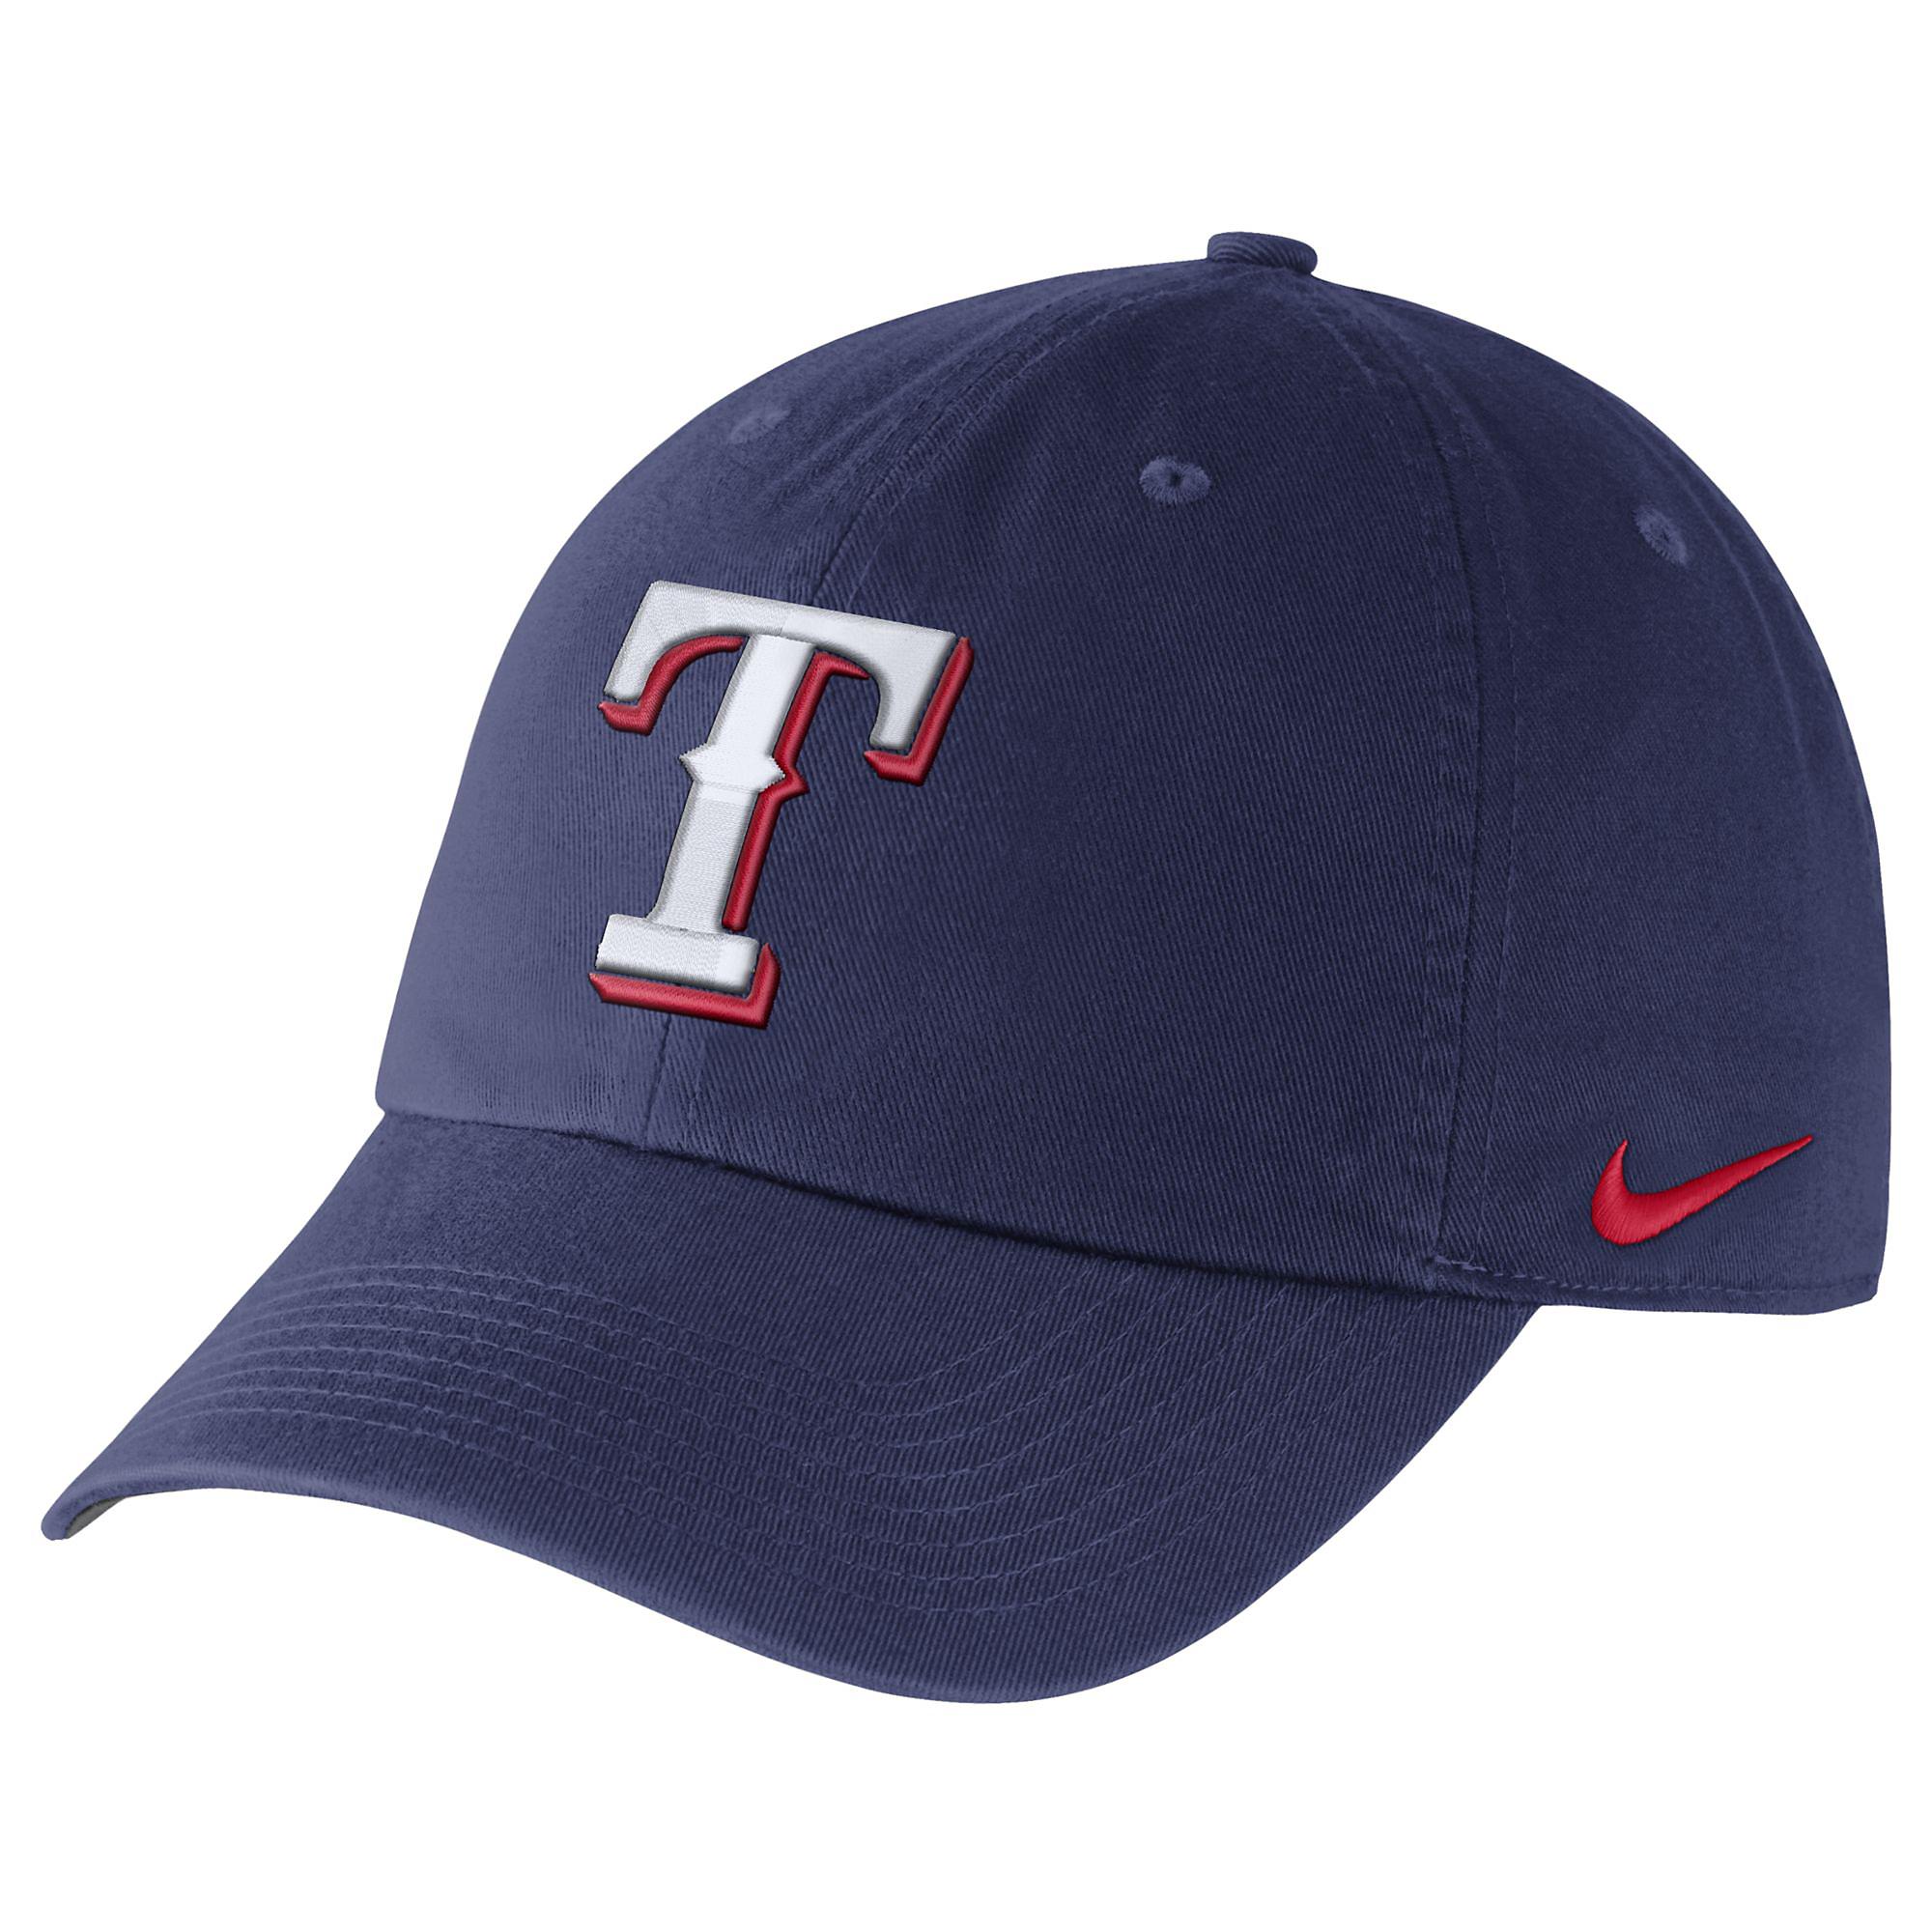 95aaa4560 Texas Rangers Nike Heritage 86 Dri-FIT Stadium Cap | Fans United